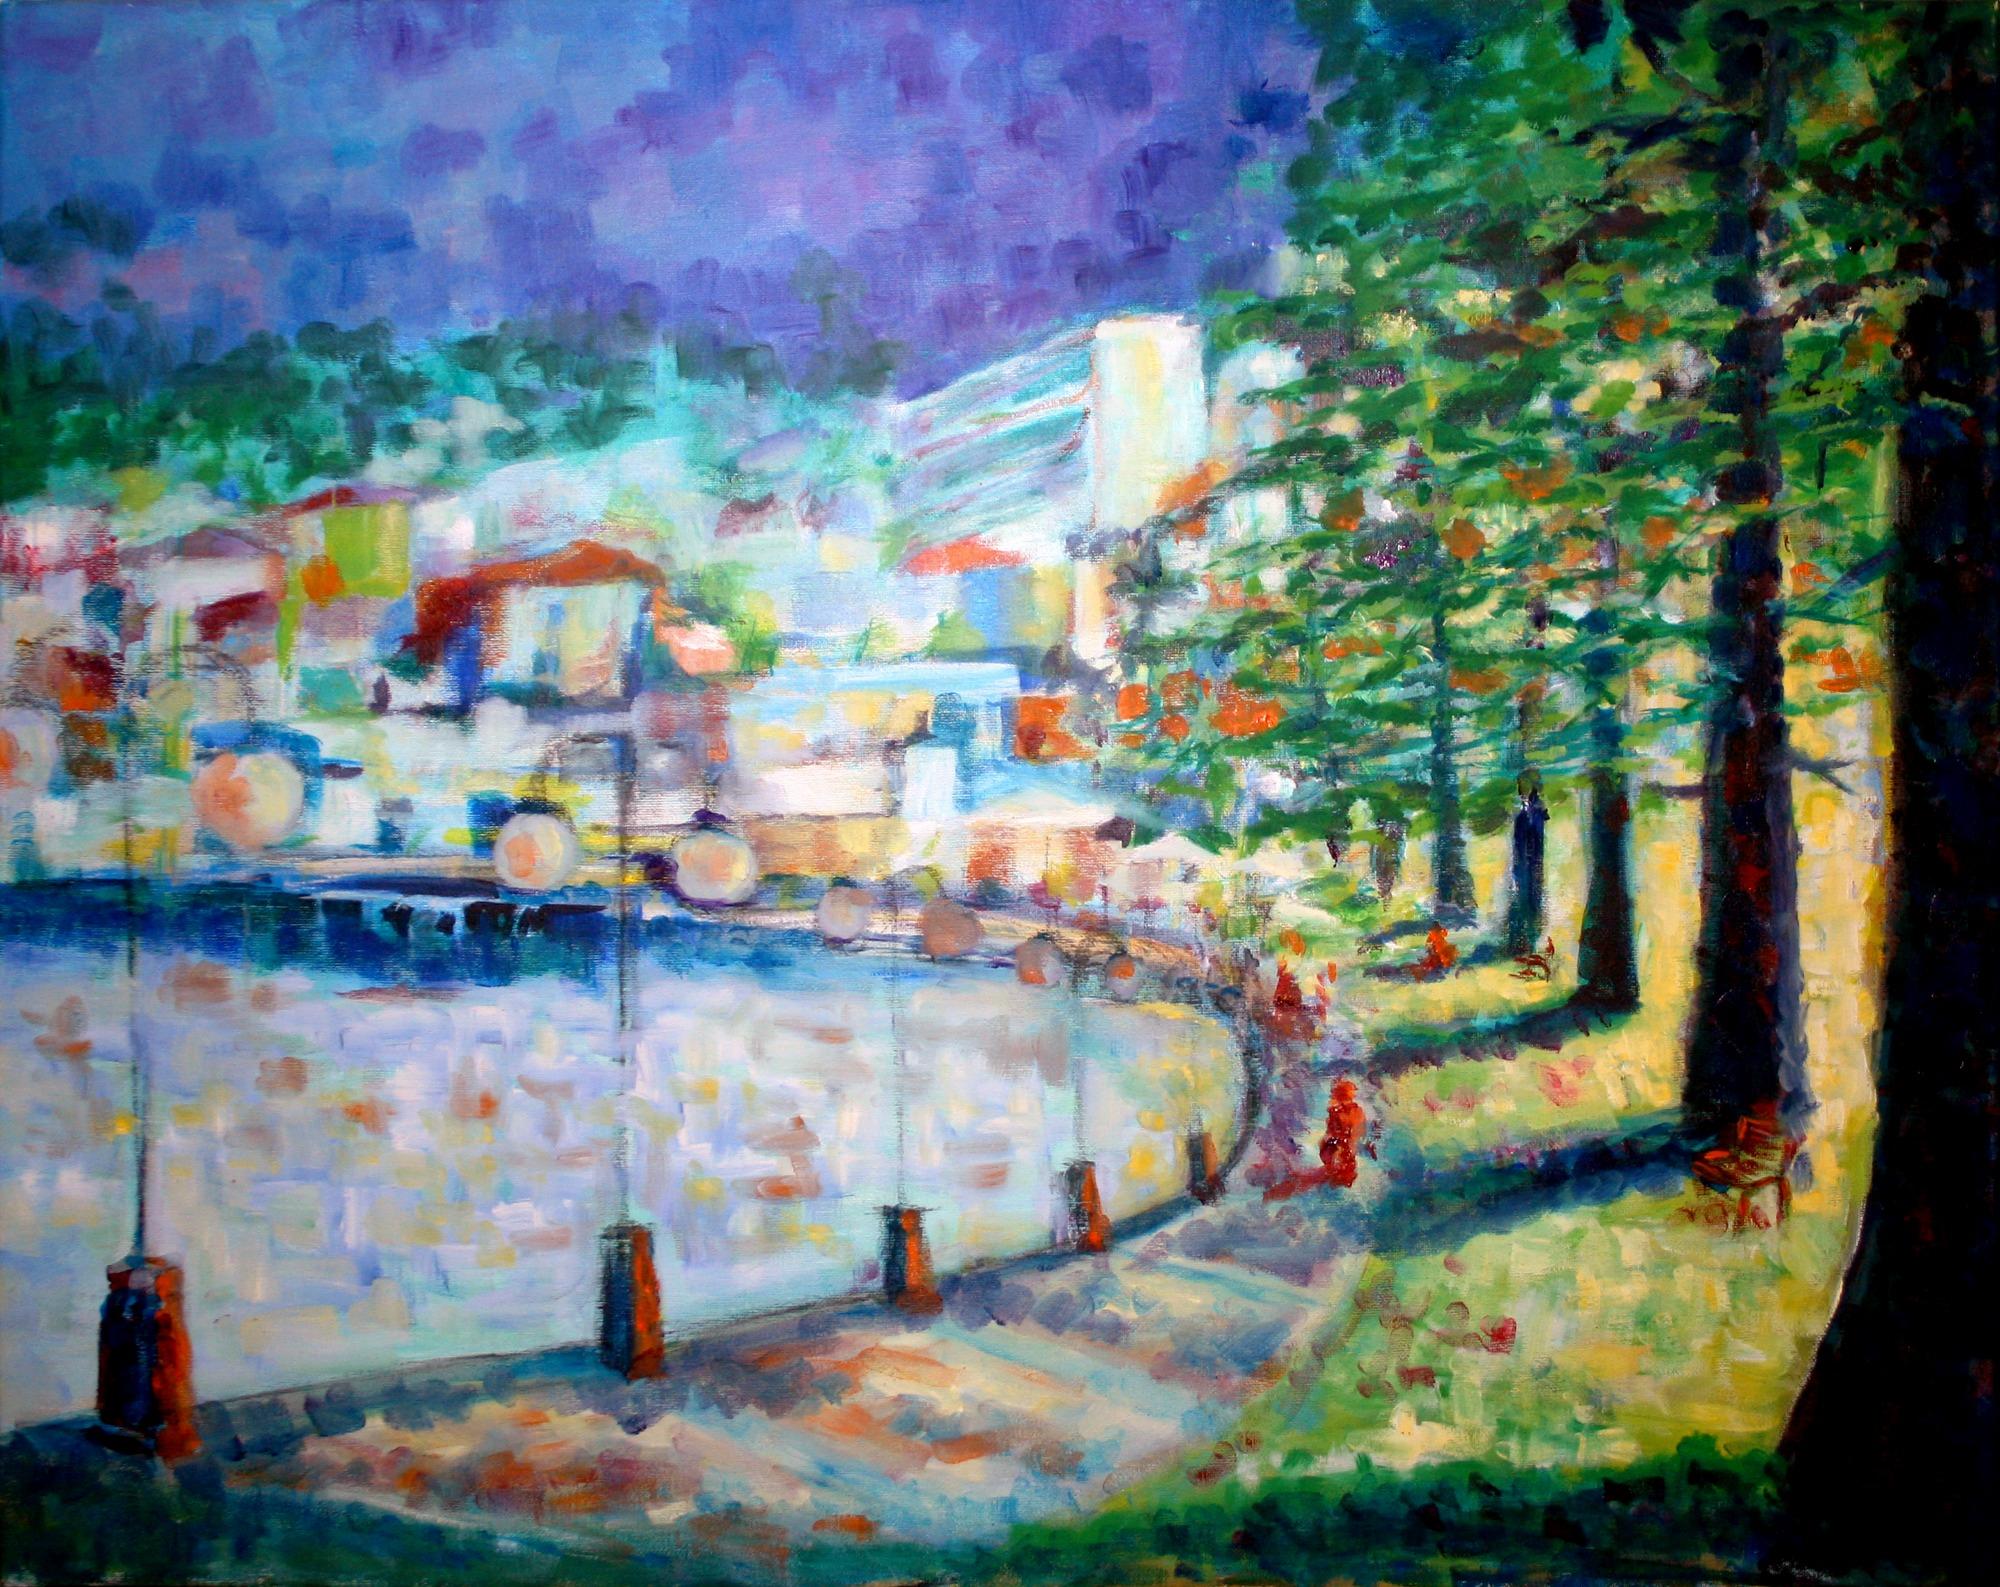 Manly Promenade